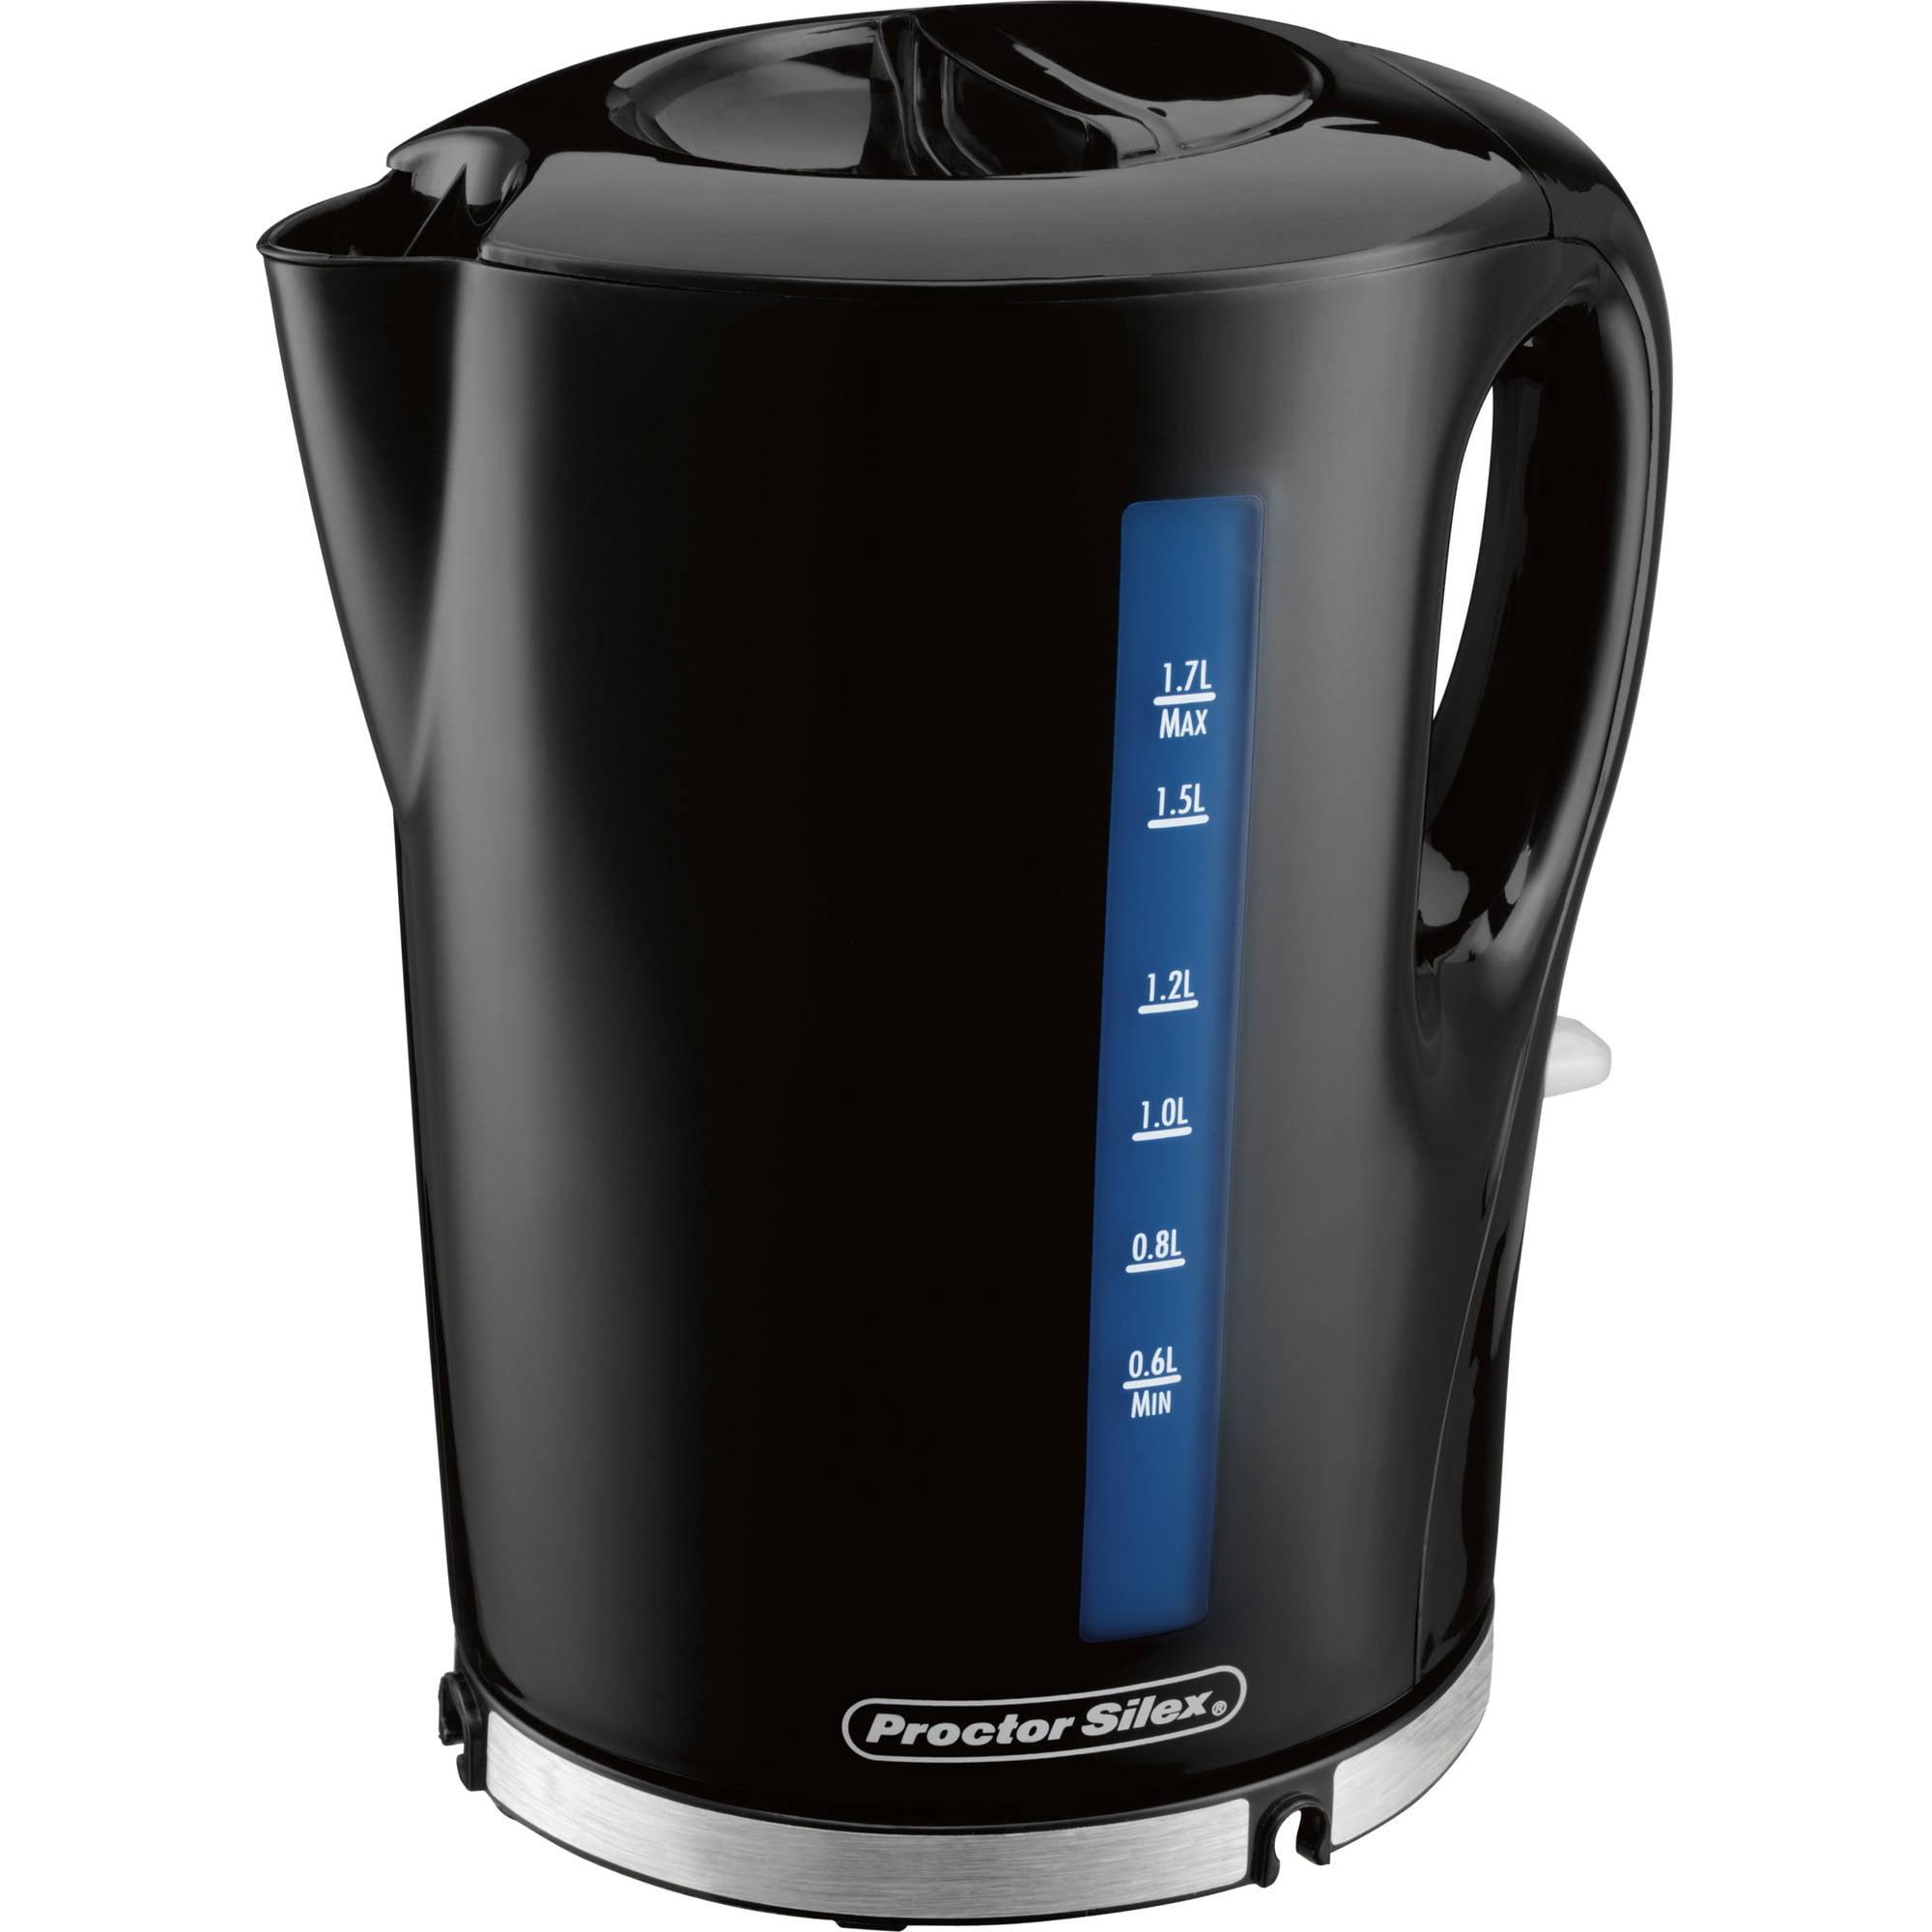 Proctor Silex 1.7 Liter Cordless Electric Kettle | Model# 41002